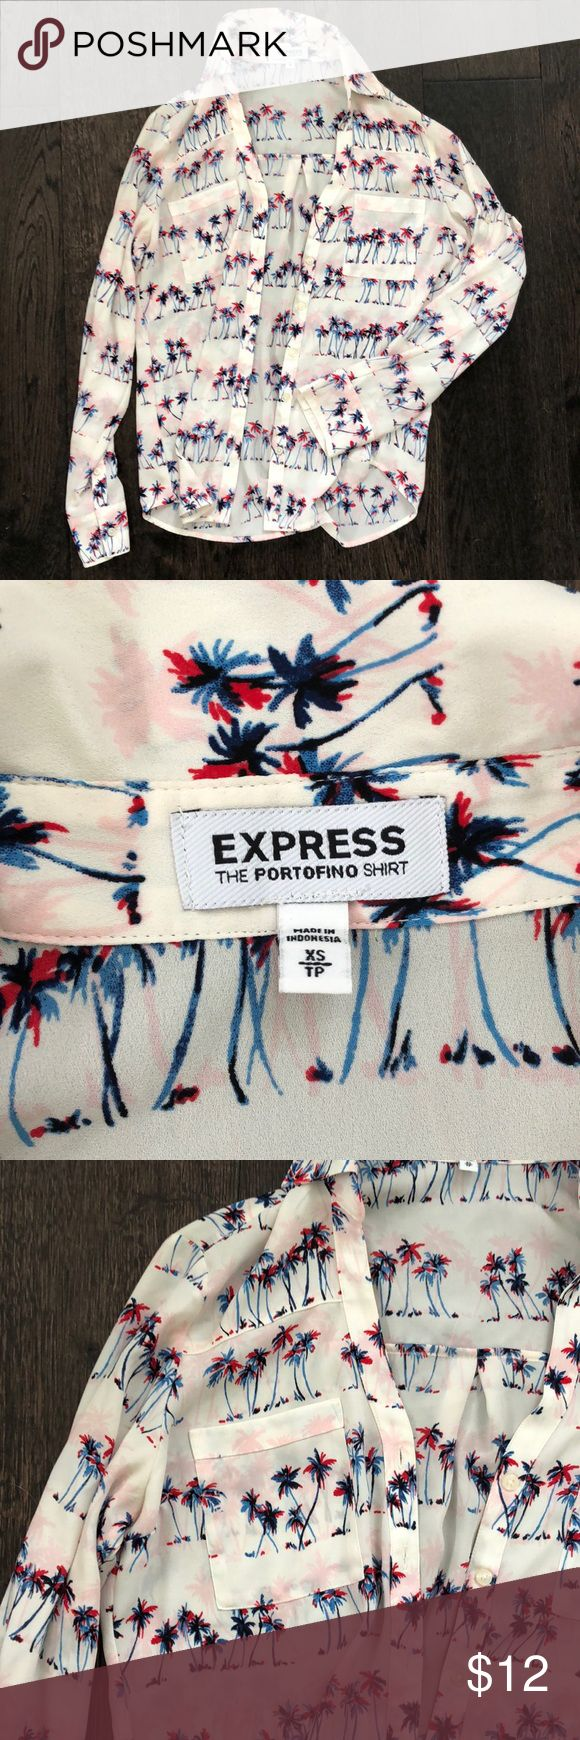 Express portofino shirt w Palm print Excellent condition, cream with neon red/pi…